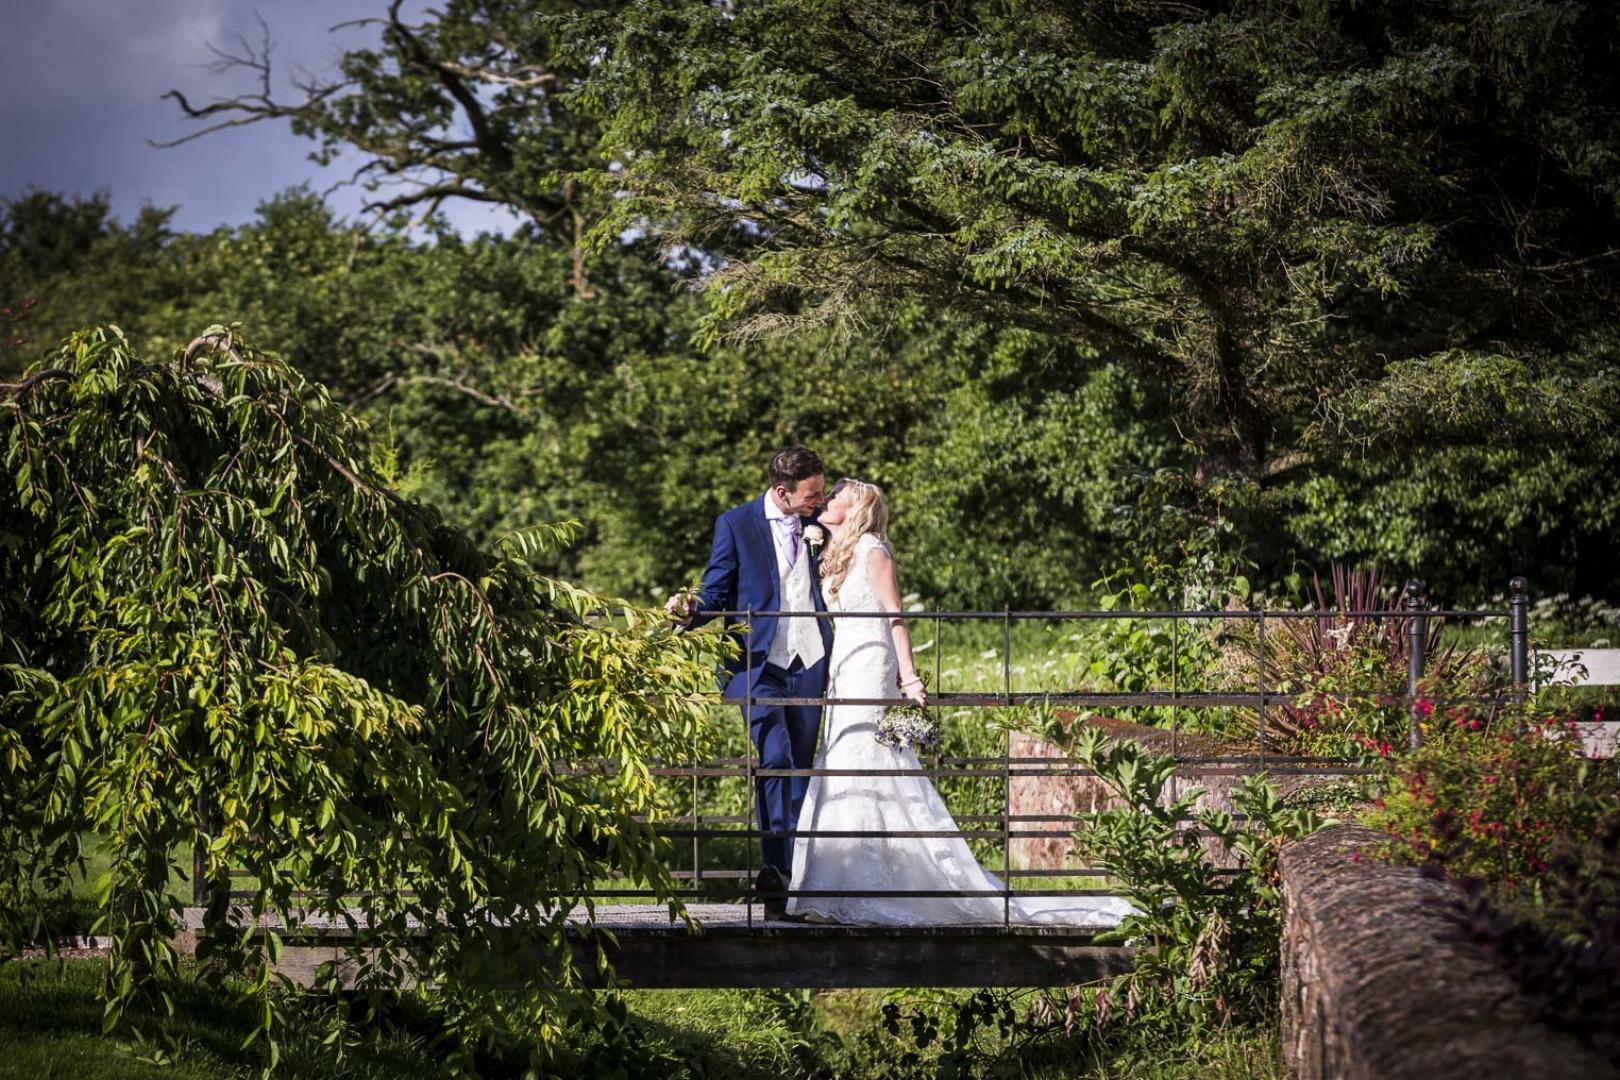 Wedding Photography - Your Wedding Photographer in Devon